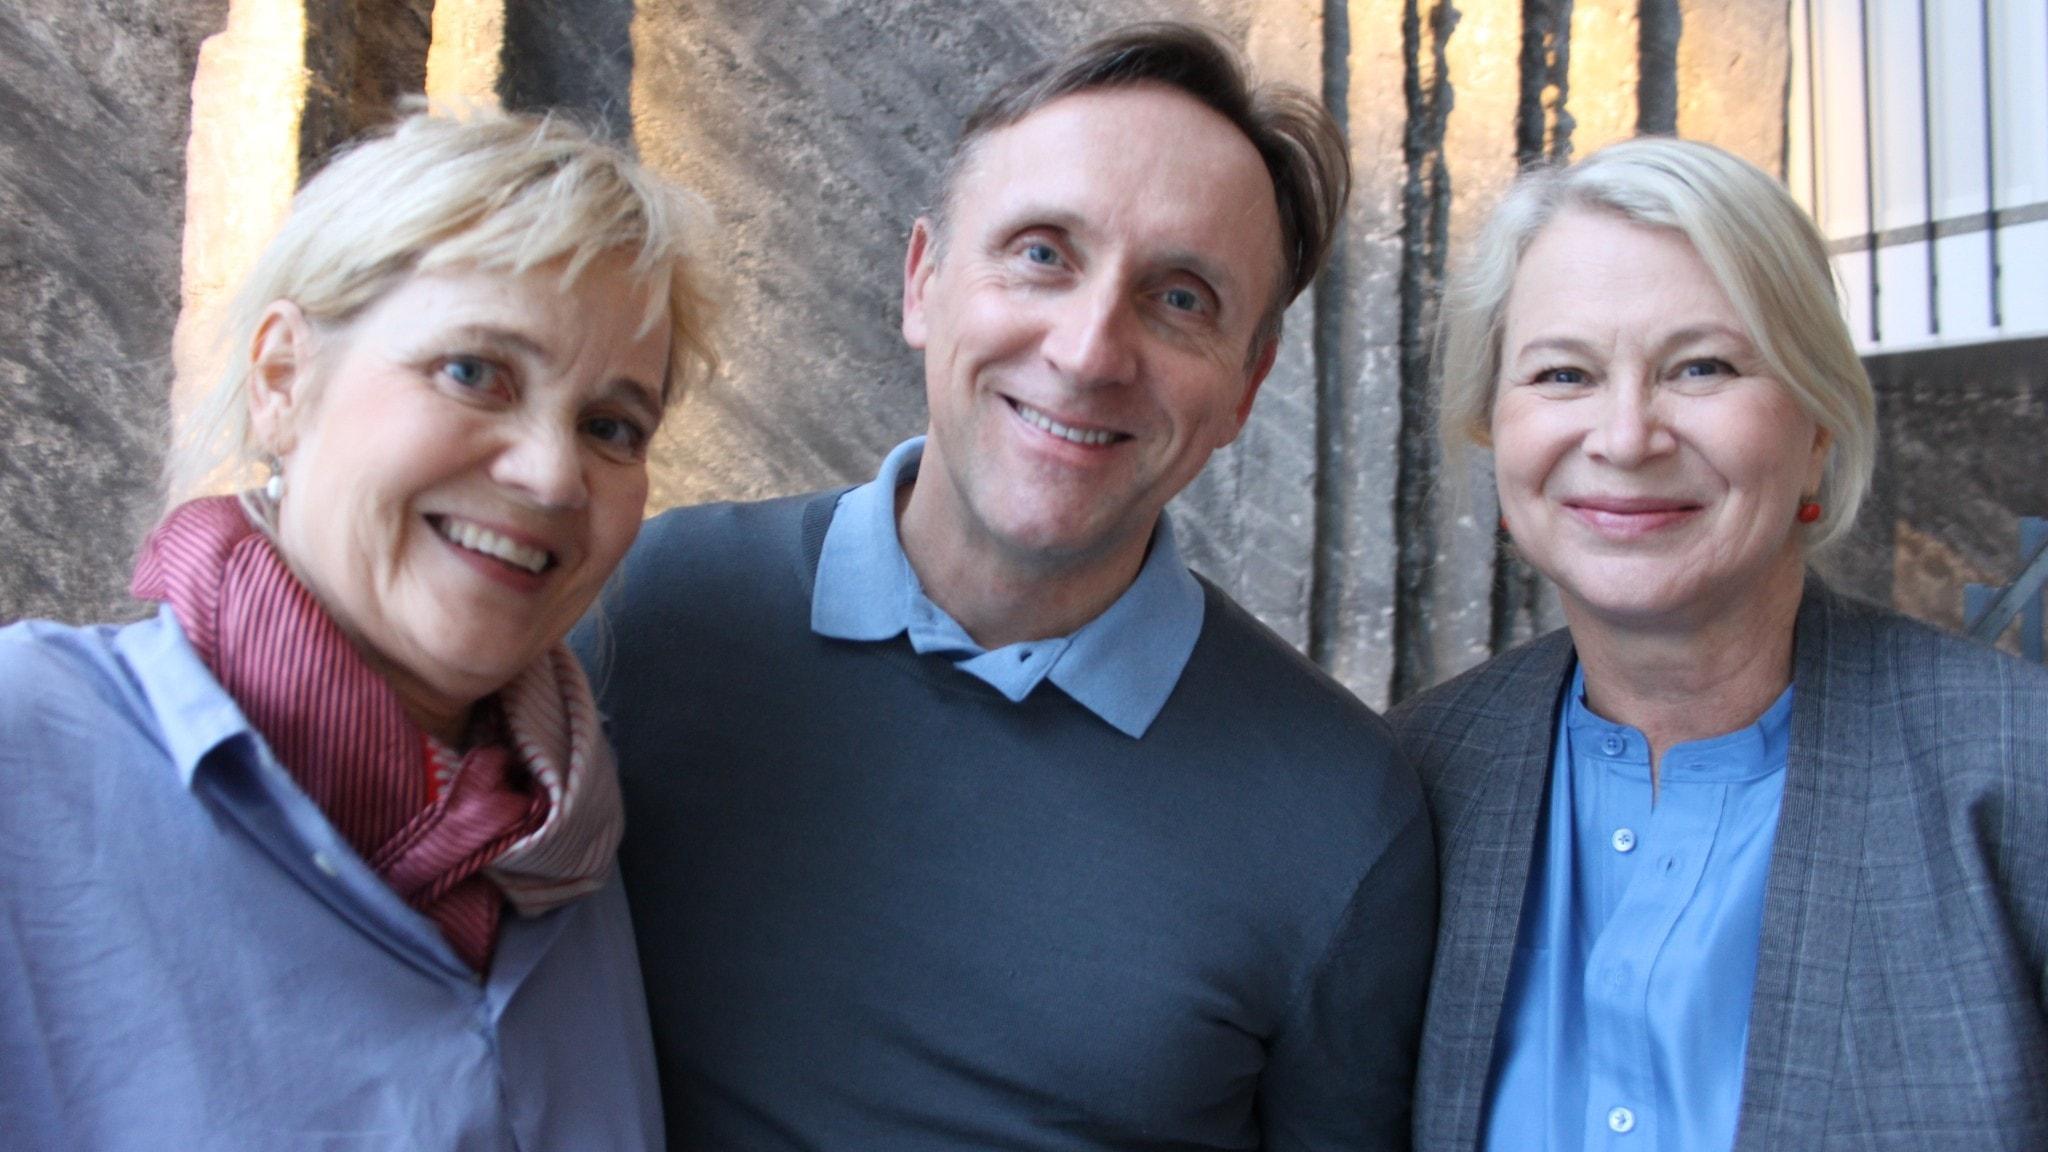 Veckans panel: Gabriella Ahlström, Göran Everdahl och Helena von Zweigbergk